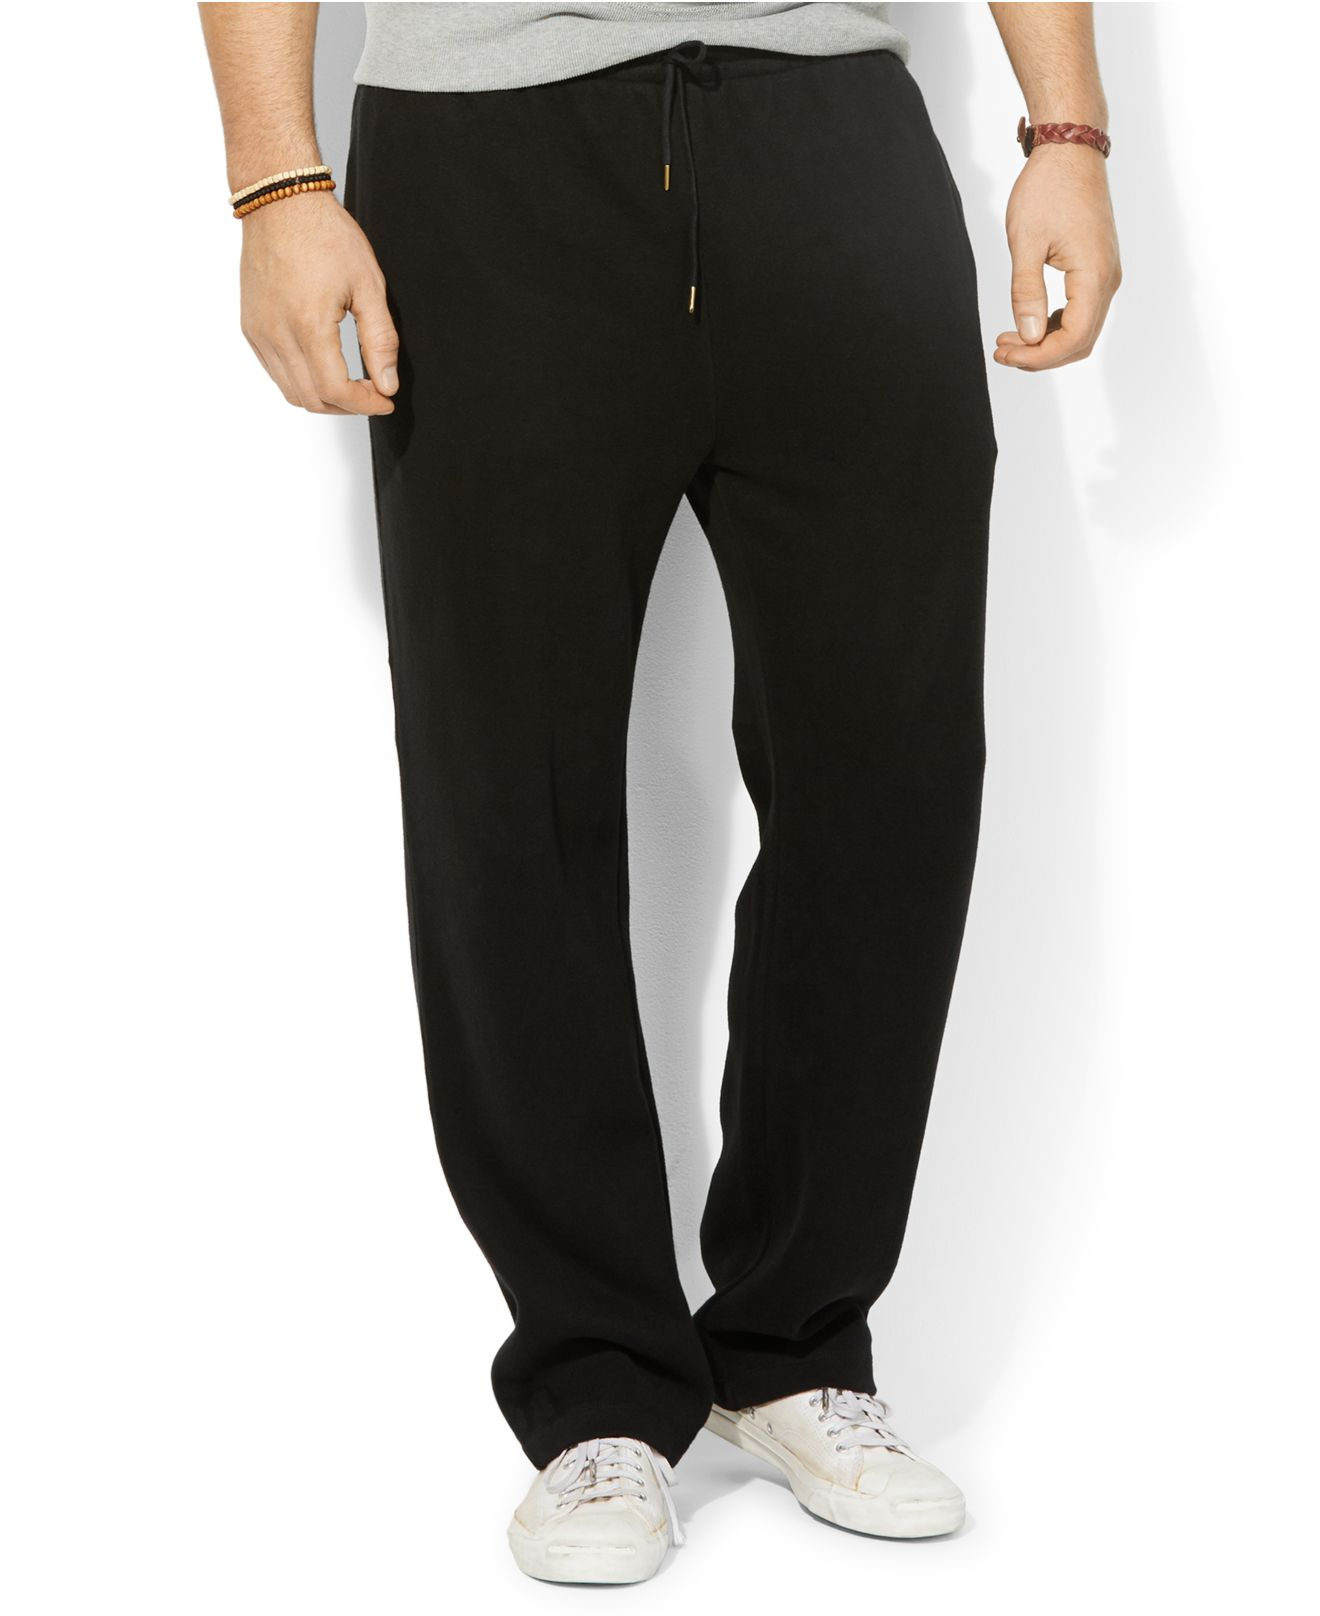 46c7f4f01 Polo Ralph Lauren Mens Big Tall Fleece Drawstring Pants